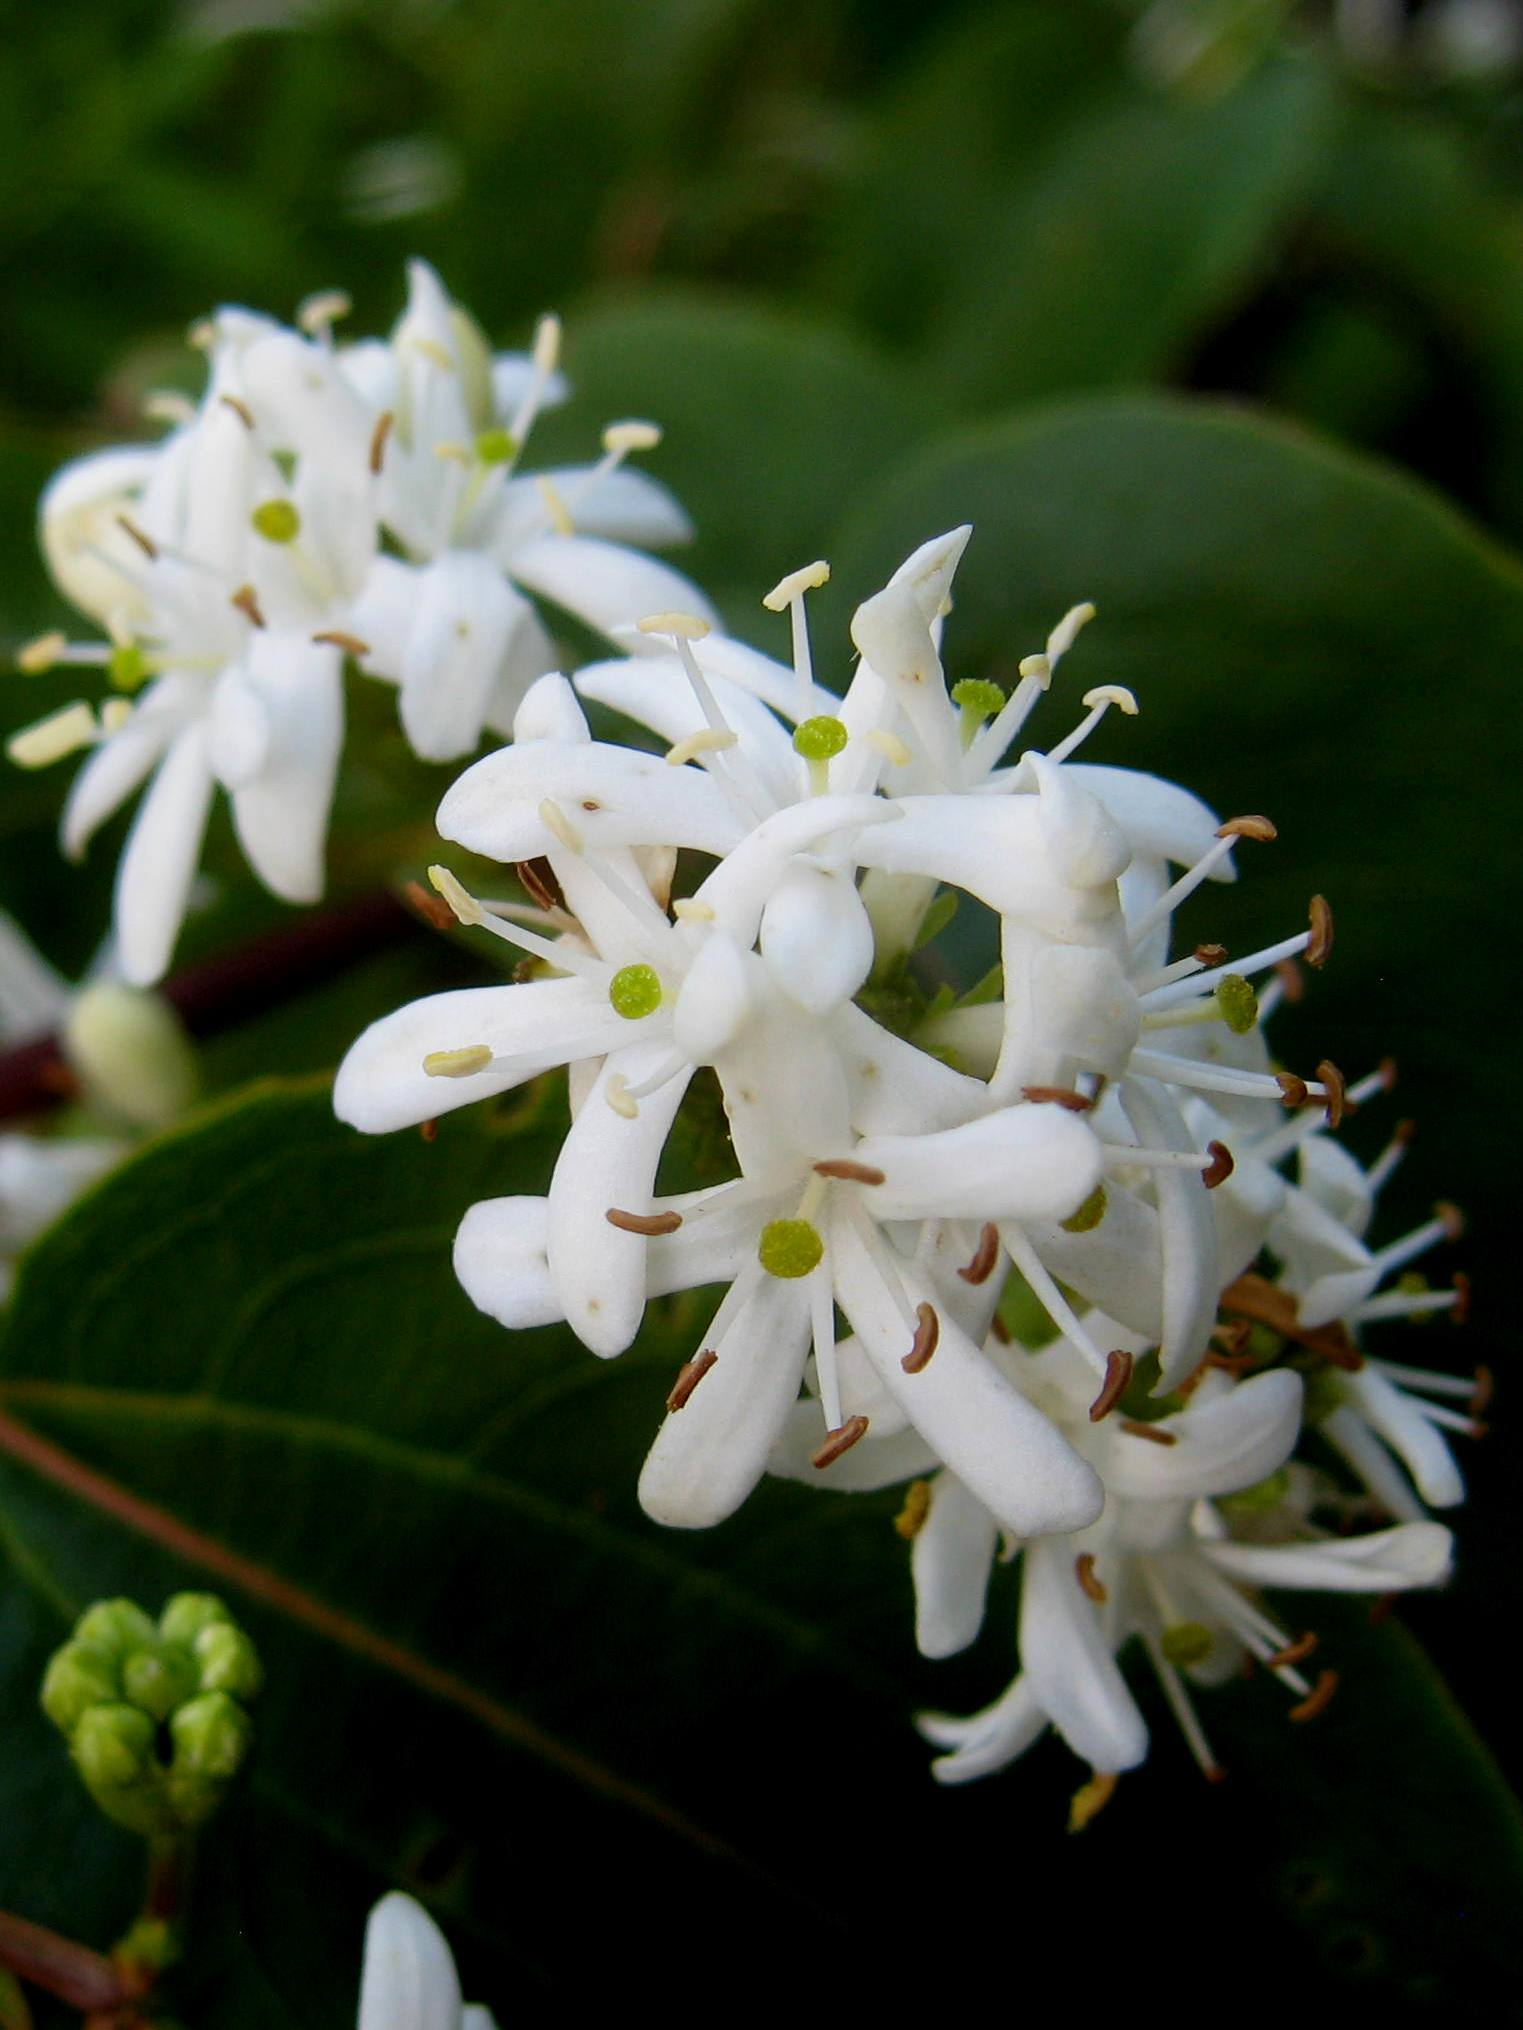 Heptacodium_miconiodes_flowers-1.jpg